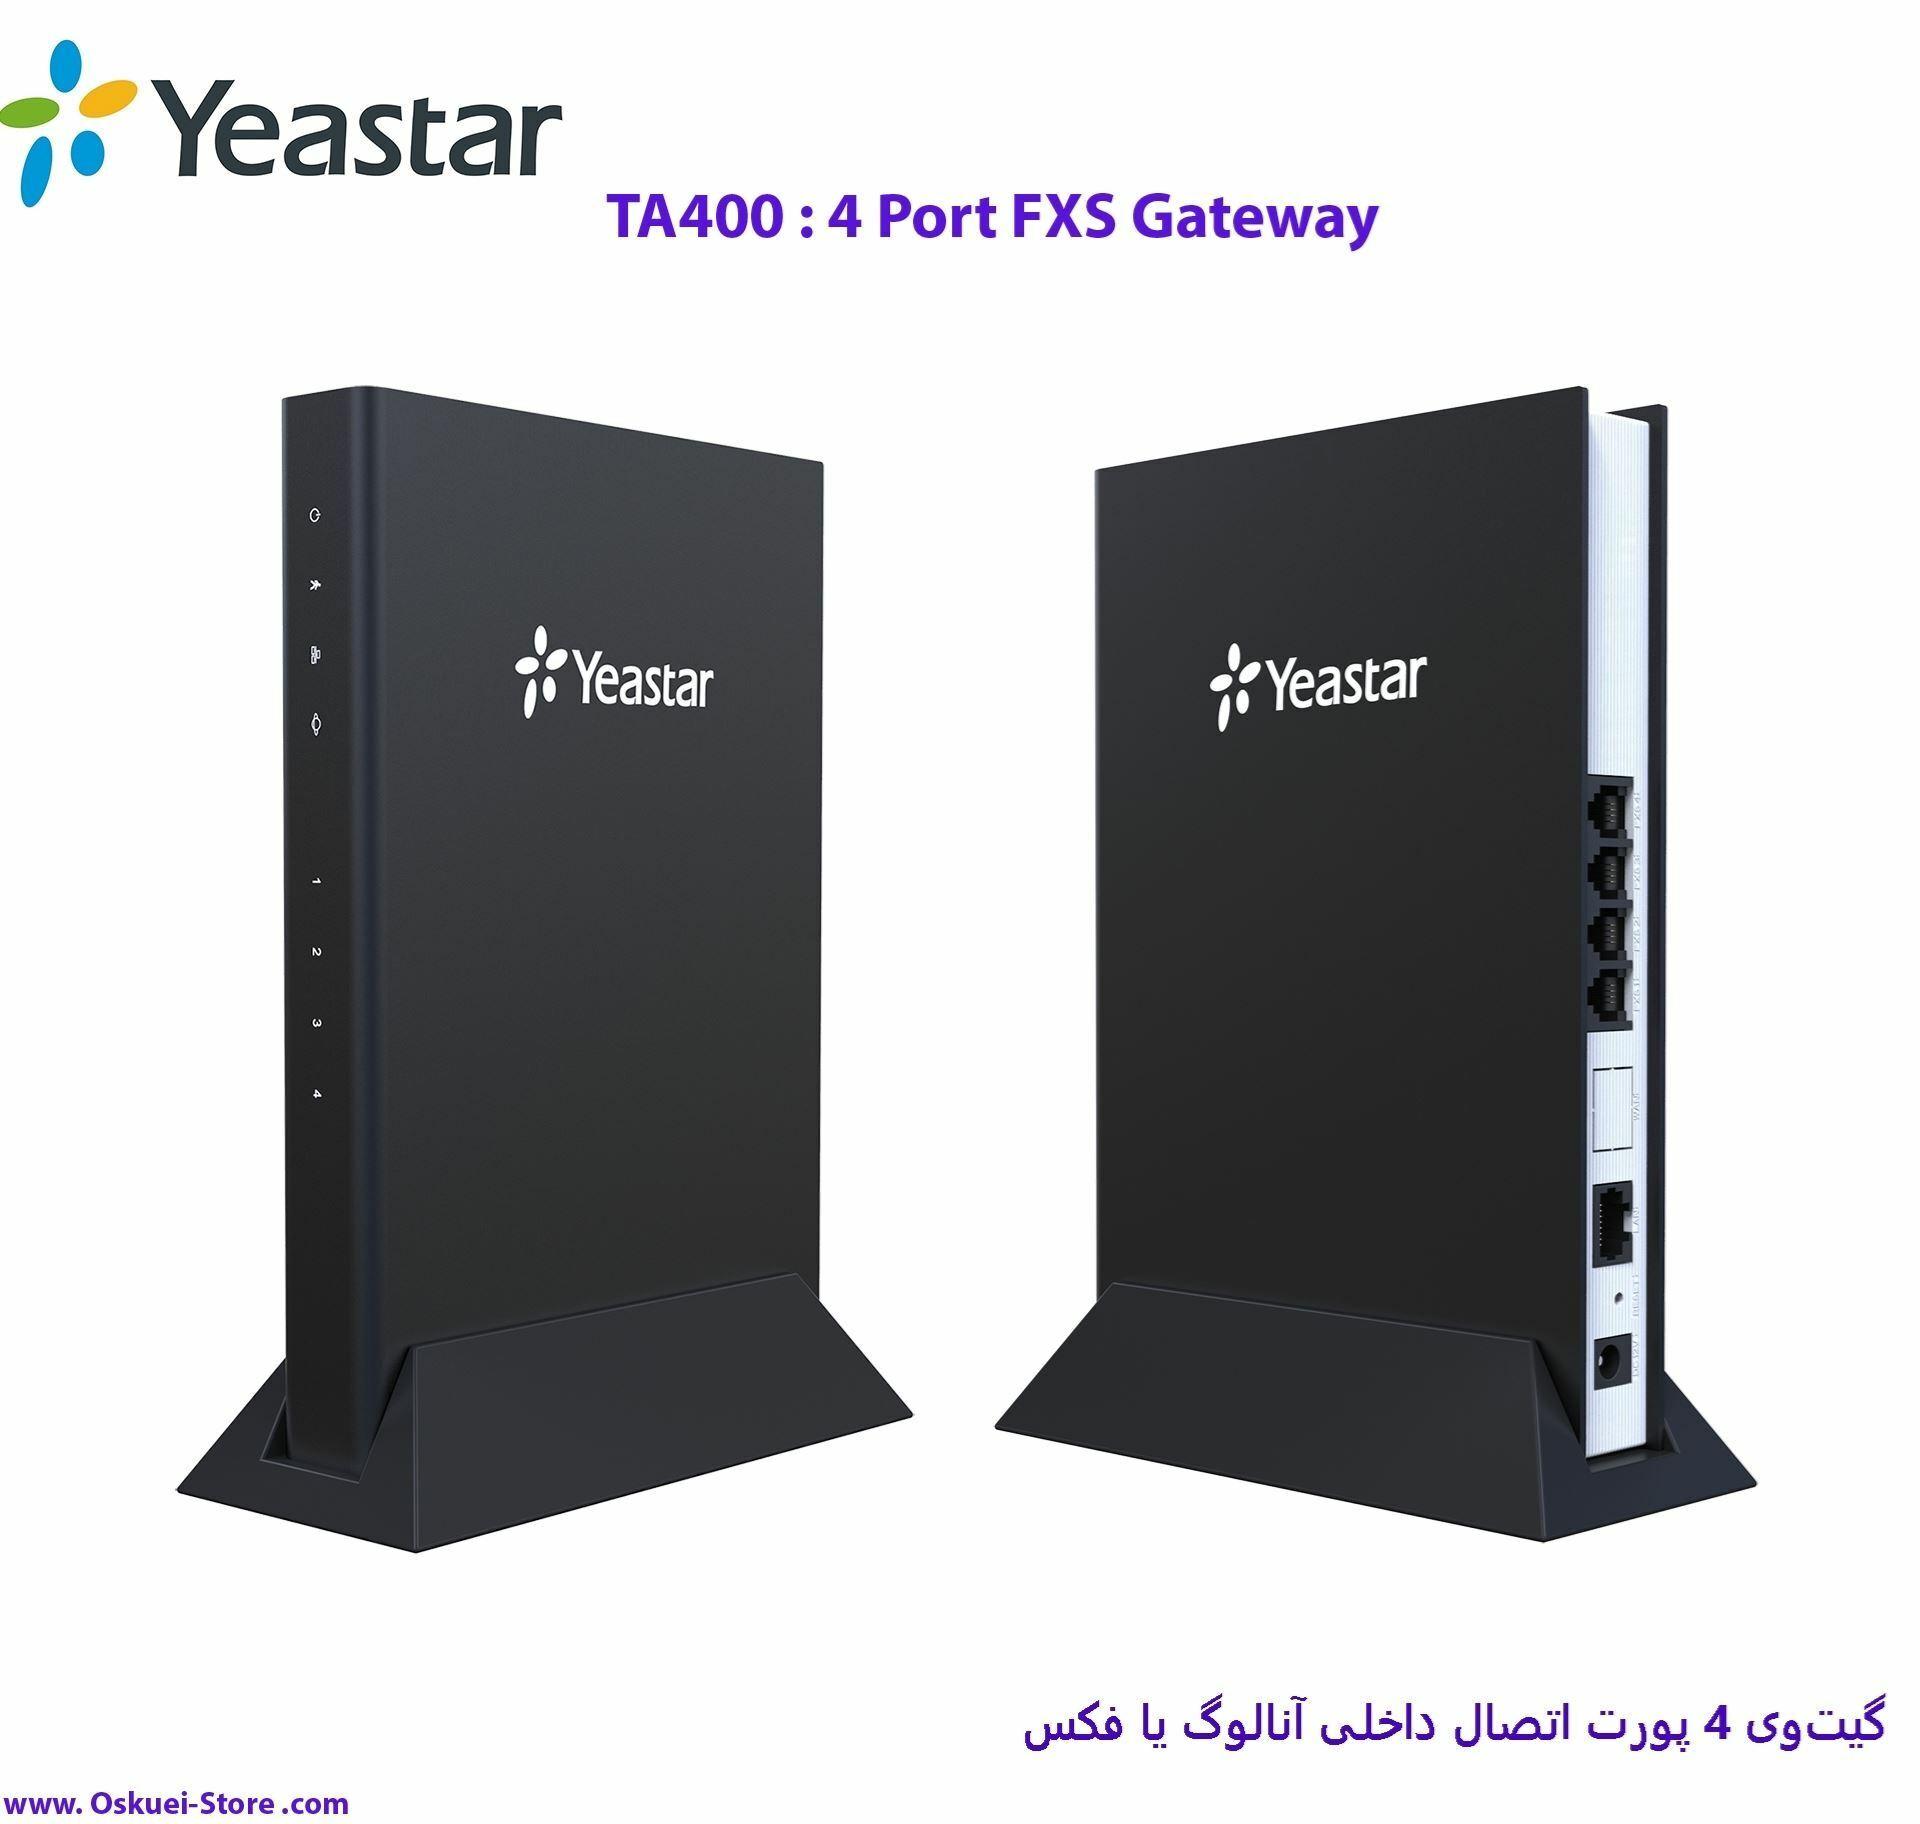 Yeastar TA400 FXS Gateway